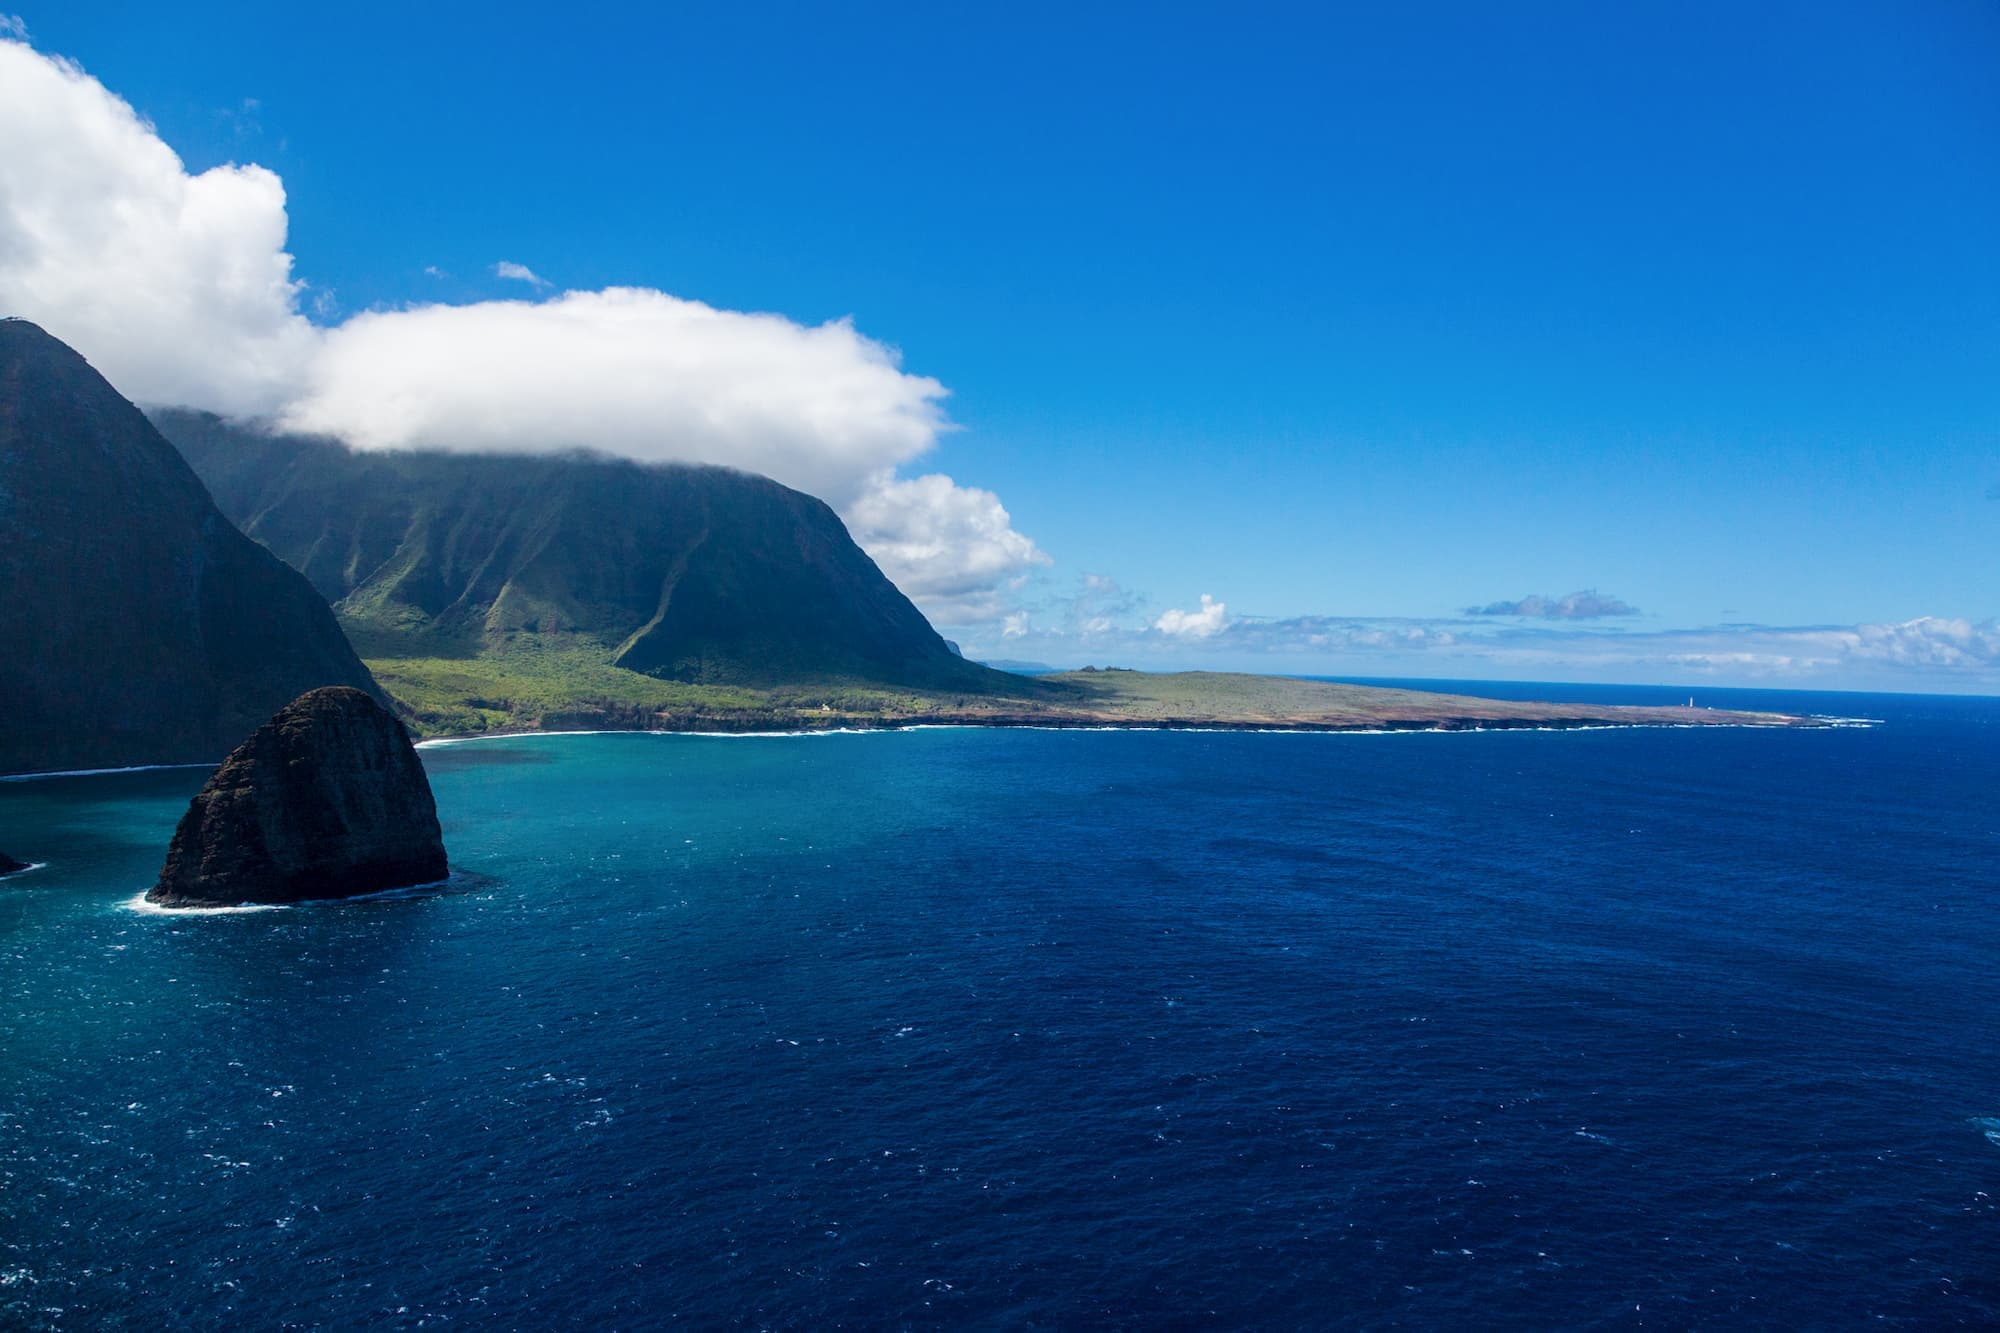 An Overview of Molokaʻi